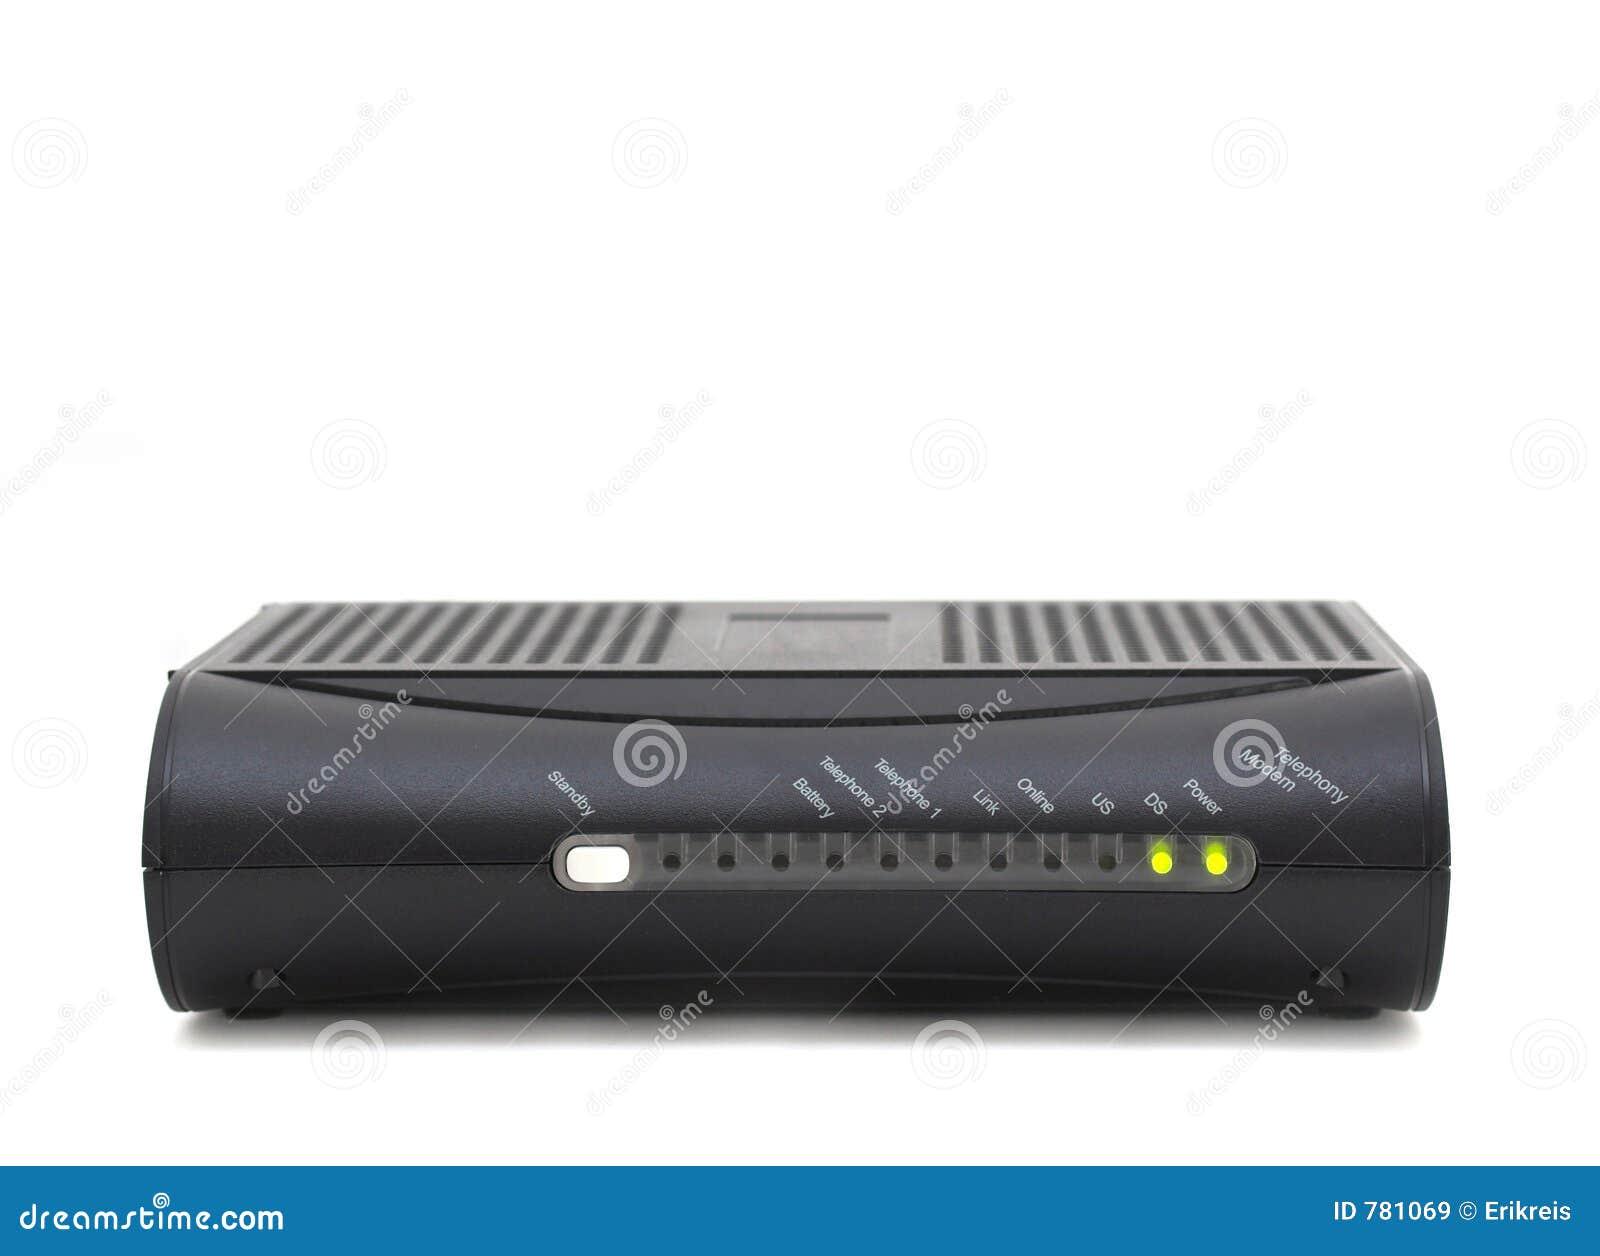 MTA cable modem